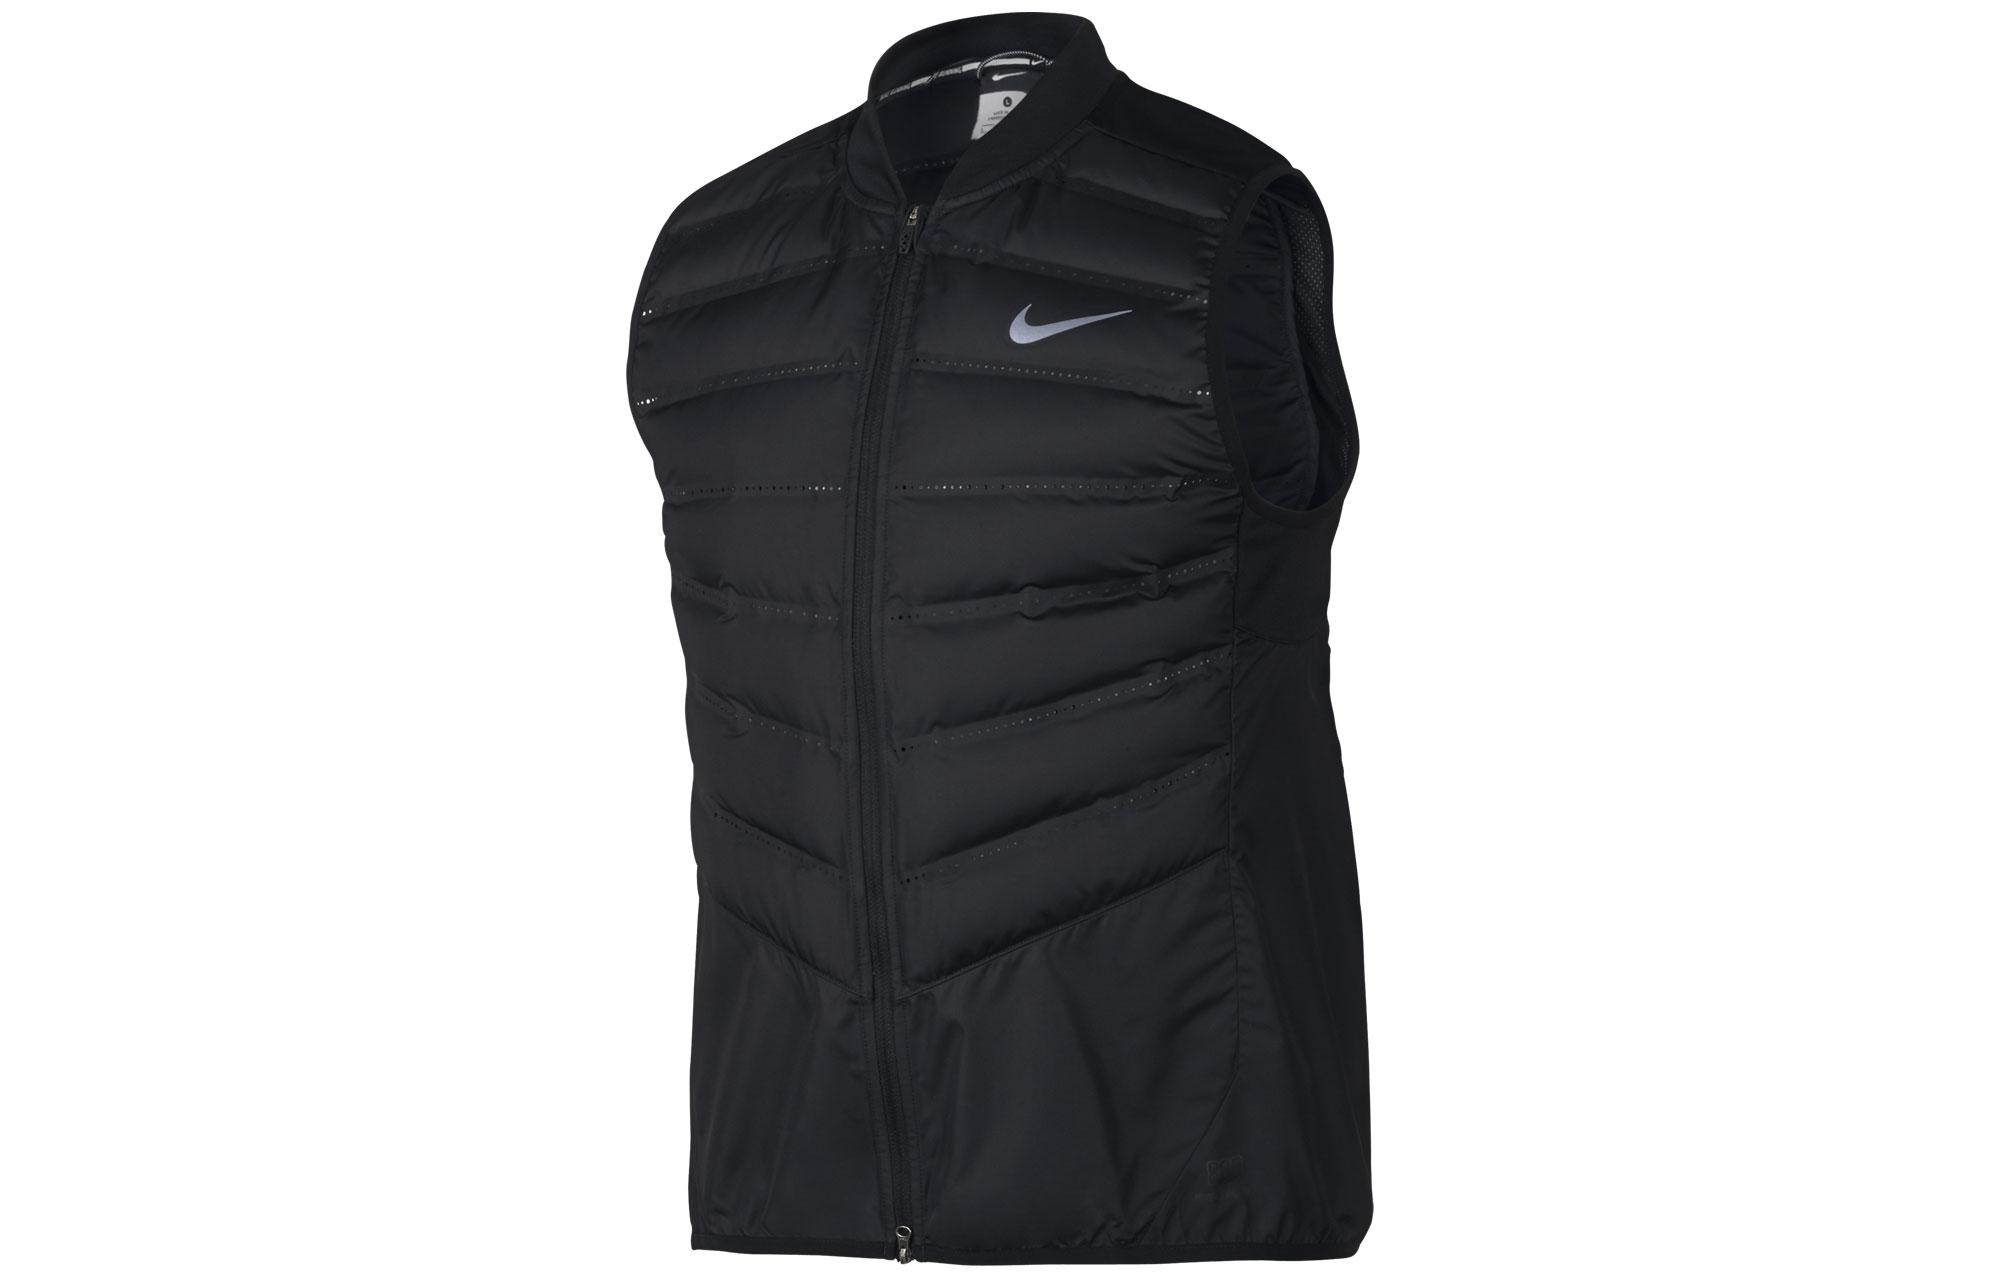 Men's Nike Gilet Sportwear Modern Vest Down Fill Black Size Large. Brand New. $ or Best Offer. Nike Men's Modern Quilted Gilet Down Vest Size: Small Navy/Black $ See more like this. Men's Nike Grey/Silver Duck Down Gilet Bodywarmer Vest Large. Pre-Owned.